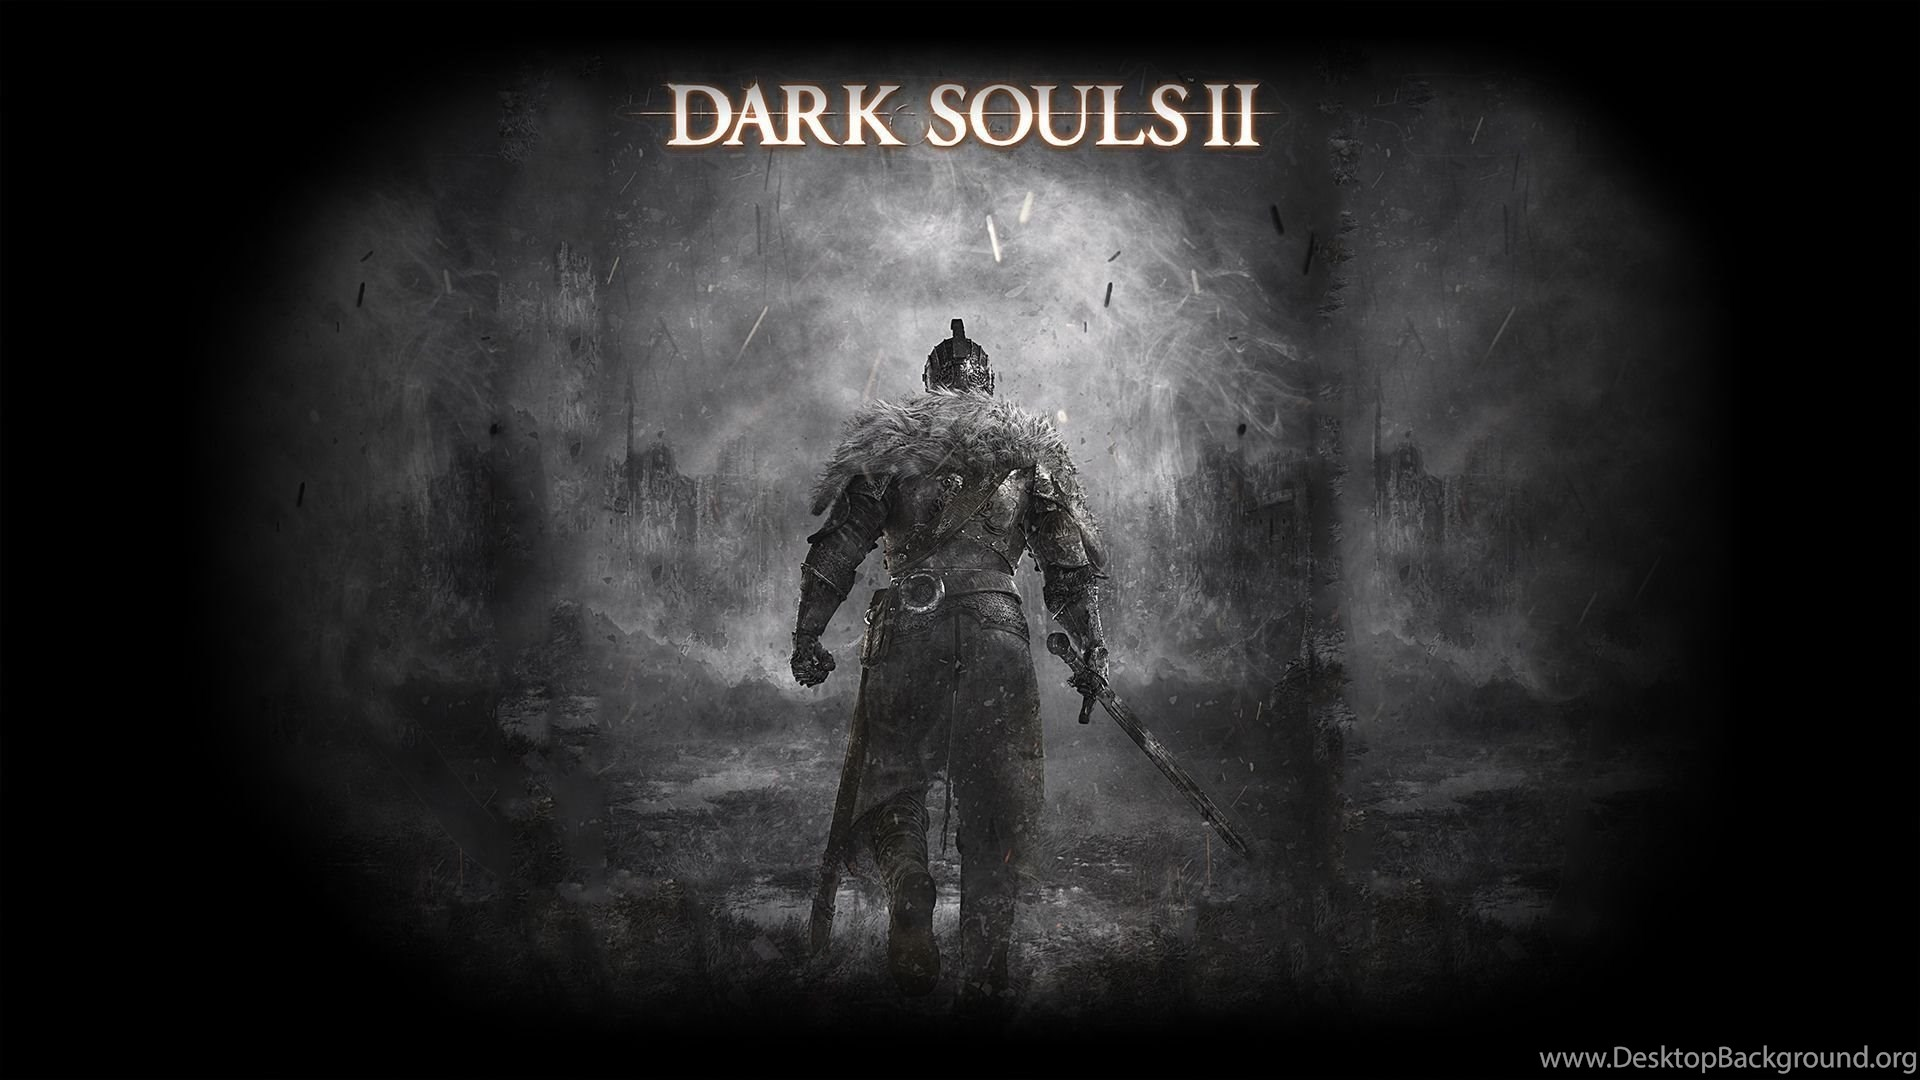 Dark Souls 2 Wallpaper Jpg Desktop Background